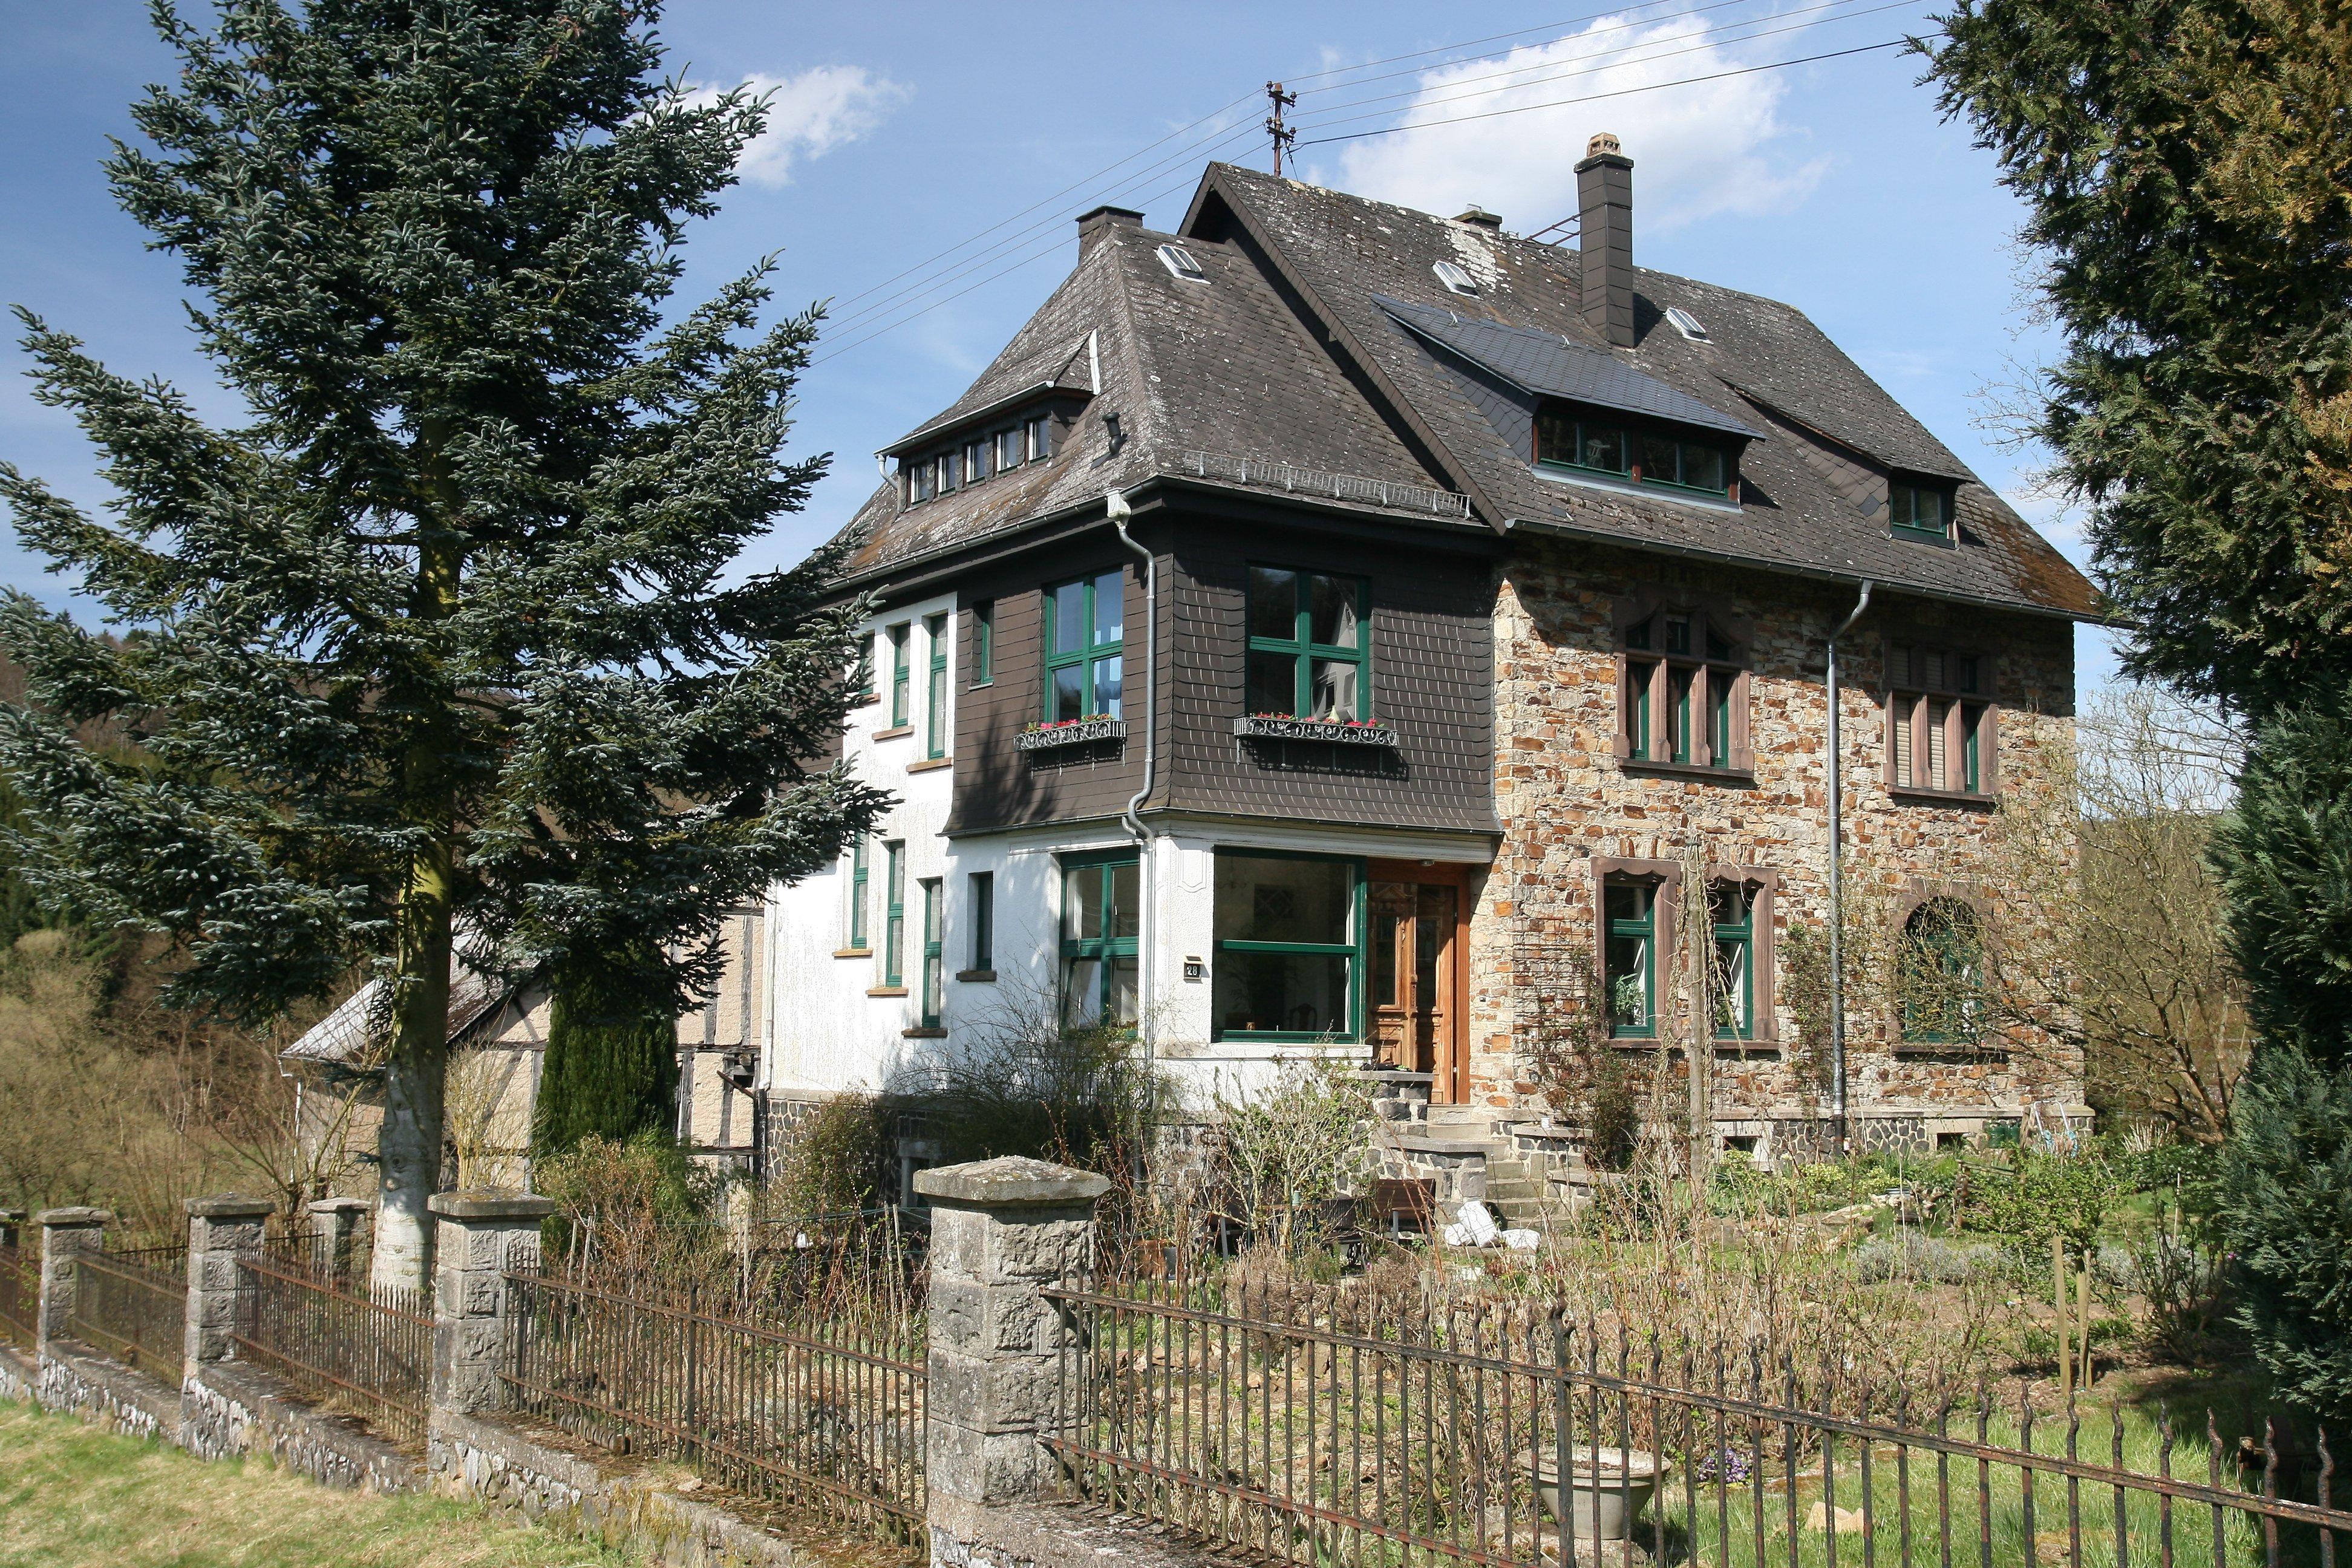 Datei:Villa Cultural Heritage Hundsdorf Ww Germany.jpg – Wikipedia